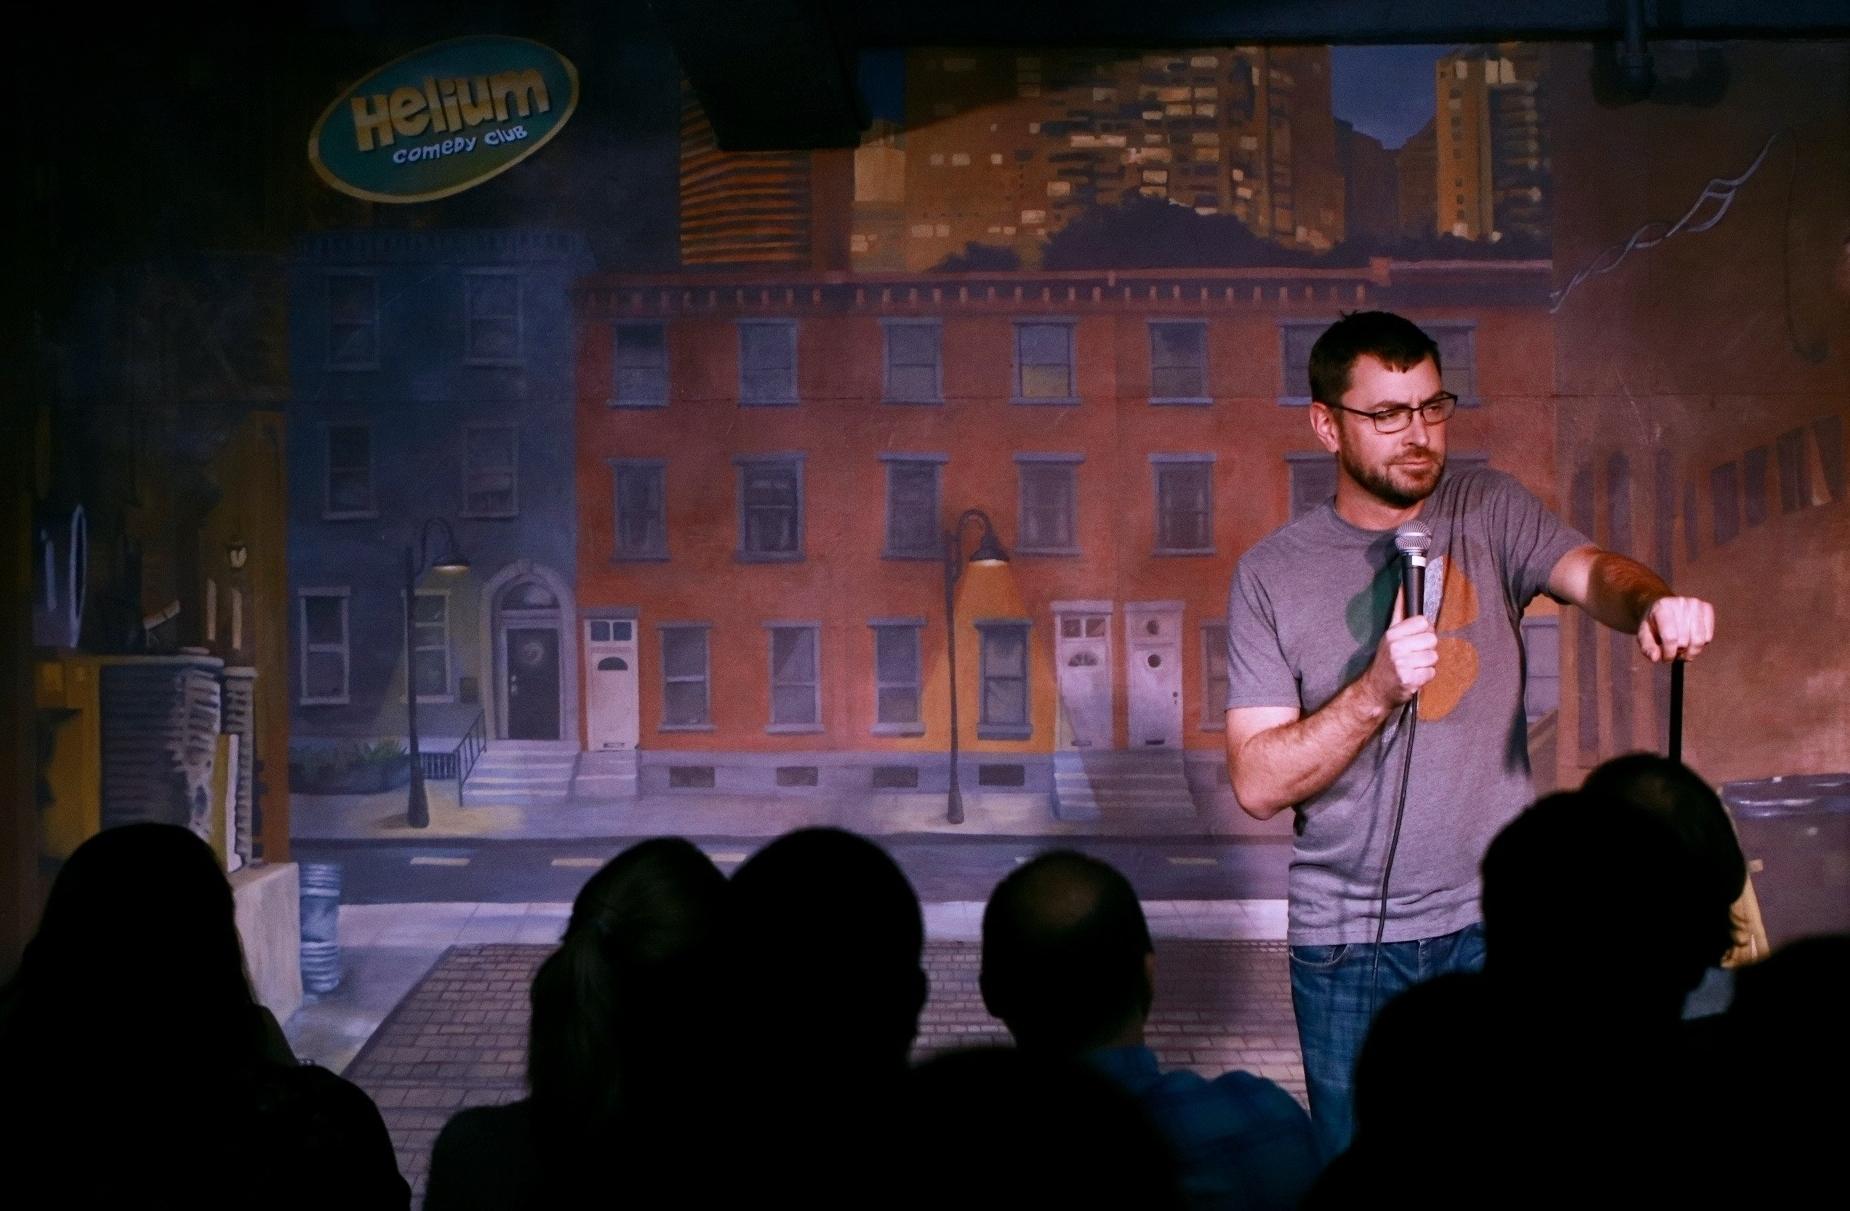 Past Appearances - Comedy Clubs:Bananas - Hasbrouck Heights, NJCap City Comedy Club - Austin, TXCobb's Comedy Club - San Francisco, CAThe Comedy Zone - Charleston, WVThe Comedy Zone - Charlotte, NCThe Comedy Zone - Harrisburg, PAThe Comedy Zone - Jacksonville, FLDr. Grins- Grand Rapids, MIThe FunnyBone - Des Moines, IAThe FunnyBone - Hartford, CTThe FunnyBone - Liberty, OHGoodnight's - Raleigh, NC Helium Comedy Club - Buffalo, NYHelium Comedy Club - Philadelphia, PAHelium Comedy Club - Portland, ORHelium Comedy Club - St. Louis, MOHilarities - Cleveland, OHImprov - Kansas City, MOImprov - San Antonio, TXImprov - Washington, DCImprov - West Palm Beach, FLJr.'s Last Laugh - Erie, PALiberty Laughs - Fredericksburg, VAMagooby's Joke House - Timonium, MDParlor Live - Bellevue, WAThe Punchline - Atlanta, GAThe Punchline - Philadelphia, PAThe Punchline - Sacramento, CAThe Punchline - San Francisco, CAThe Secret Group - Houston, TXSpokane Comedy Club - Spokane, WAStand-Up Live - Huntsville, ALStand-Up Live - Phoenix, AZThe Stardome - Birmingham, ALStitches Comedy Club - Lancaster, PAThe Stress Factory - New Brunswick, NJTacoma Comedy Club - Tacoma, WAVermont Comedy Club - Burlington, VTZanies - Chicago, ILZanies - Nashville, TNTheaters:Carnegie Music Hall - Pittsburgh, PACount Basie Theater - Red Bank, NJThe Electric Factory - Philadelphia, PAF.M. Kirby Center - Wilke-Barre, PAHinds Crouse Theater - Syracuse, NYHoward Theater - Washington, DCNJPAC - Newark, NJOhio Theater - Cleveland, OHThe Paramount - Huntington, NYTexas Theatre - Dallas, TXTower Theater - Philadelphia, PAThe Trocadero - Philadelphia, PAWarner Theater - Washington, DCWesthampton Beach Performing Arts Center - Westhampton Beach, NYWilbur Theater - Boston, MACasinos:Borgata - Atlantic City, NJFoxwoods Resort Casino - Mashantucket, CTMGM National Harbor - Oxon Hill, MDRevel - Atlantic City, NJSands - Bethlehem, PAValley Forge Casino - Valley Forge, PA